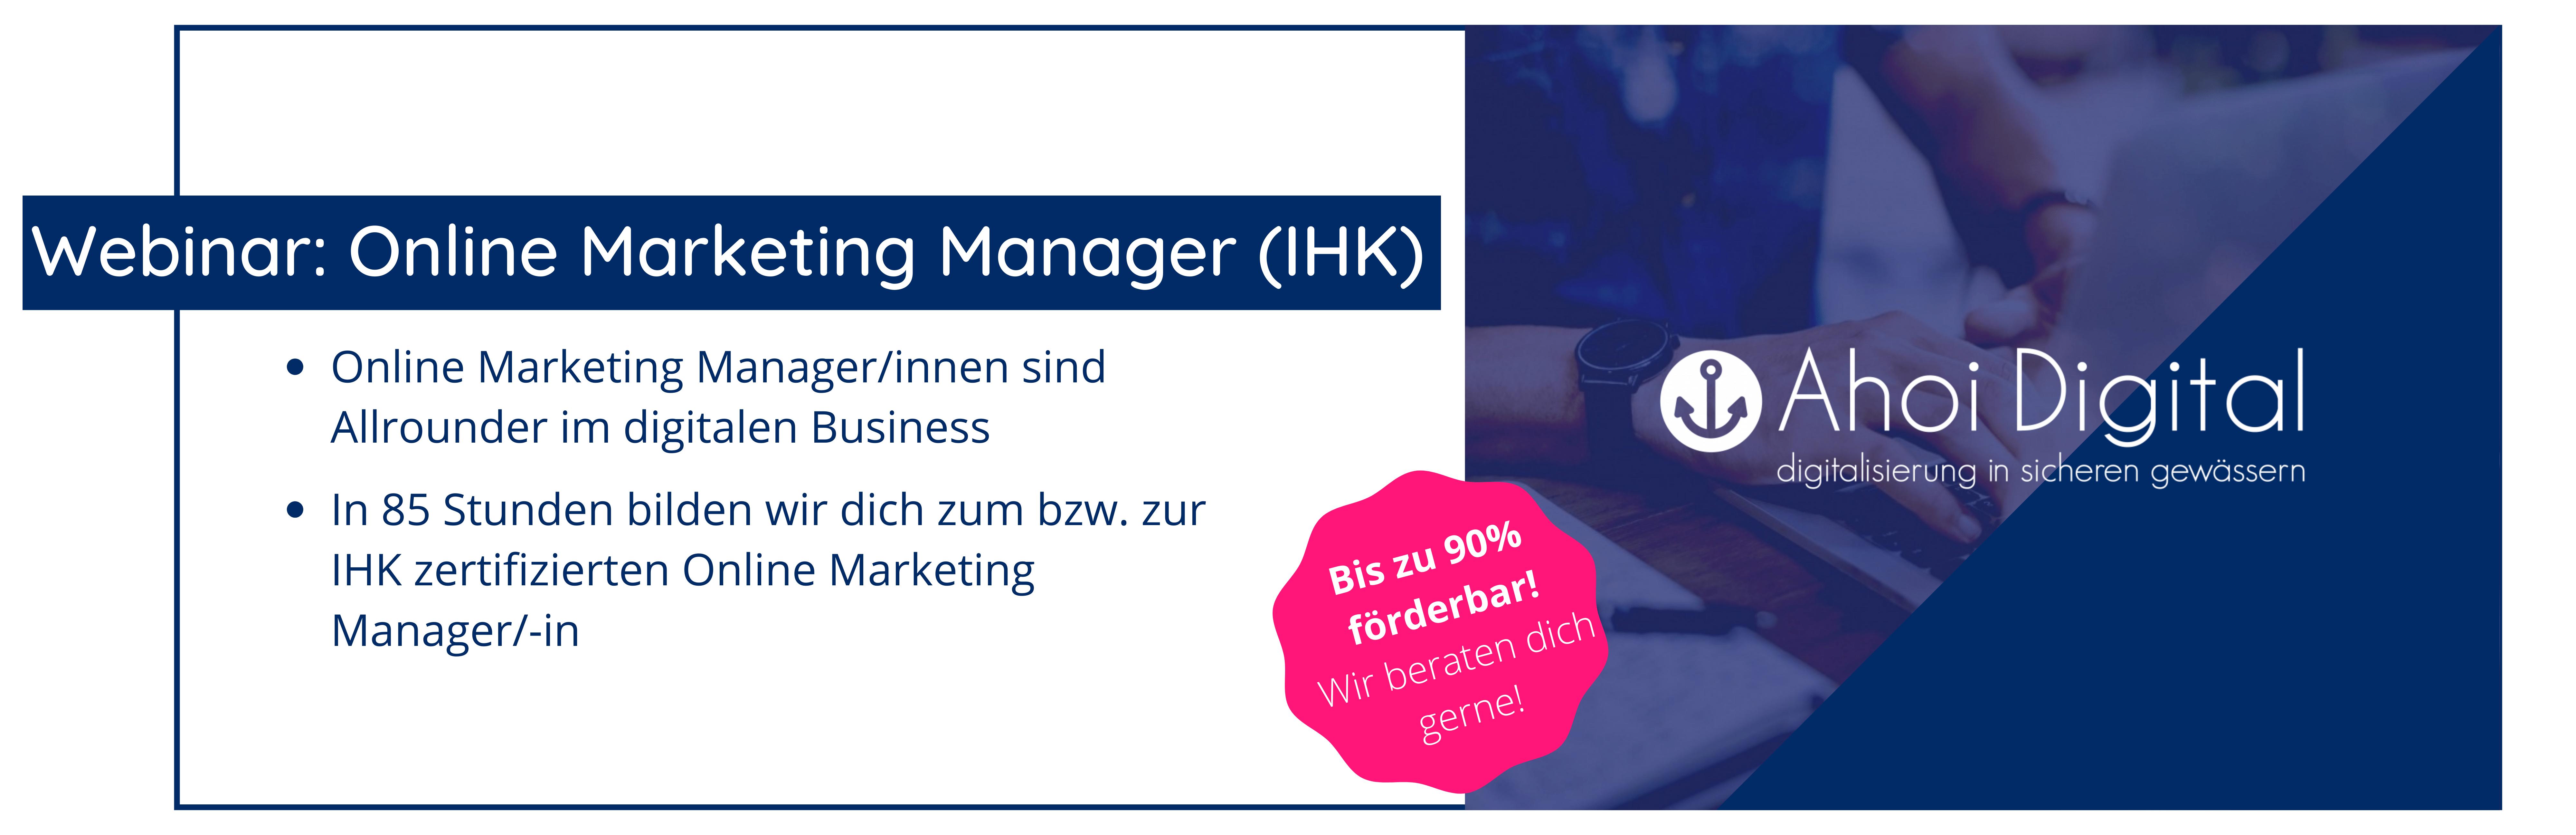 Werde Online Marketing Manager (IHK)! 1 - Social Media Agentur aus Oldenburg Social Media Agentur aus Oldenburg